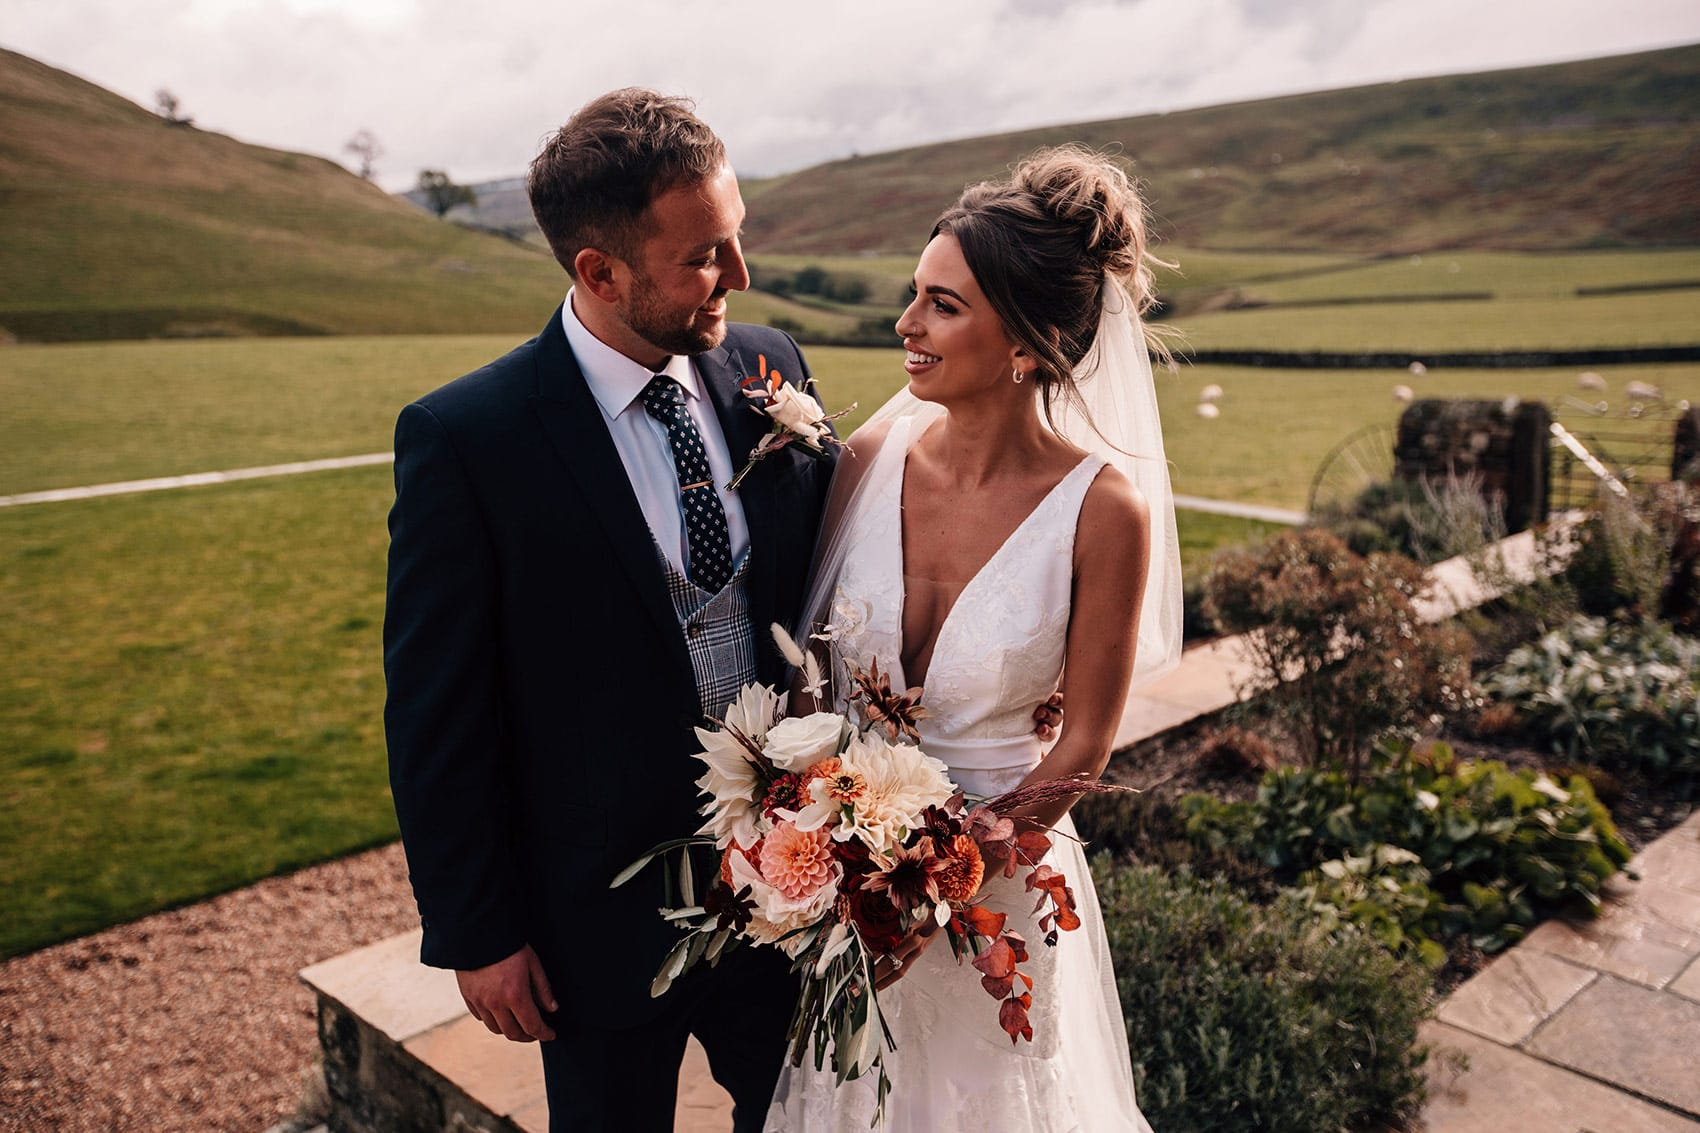 micro wedding venue Yorkshire Dales Telfit Farm